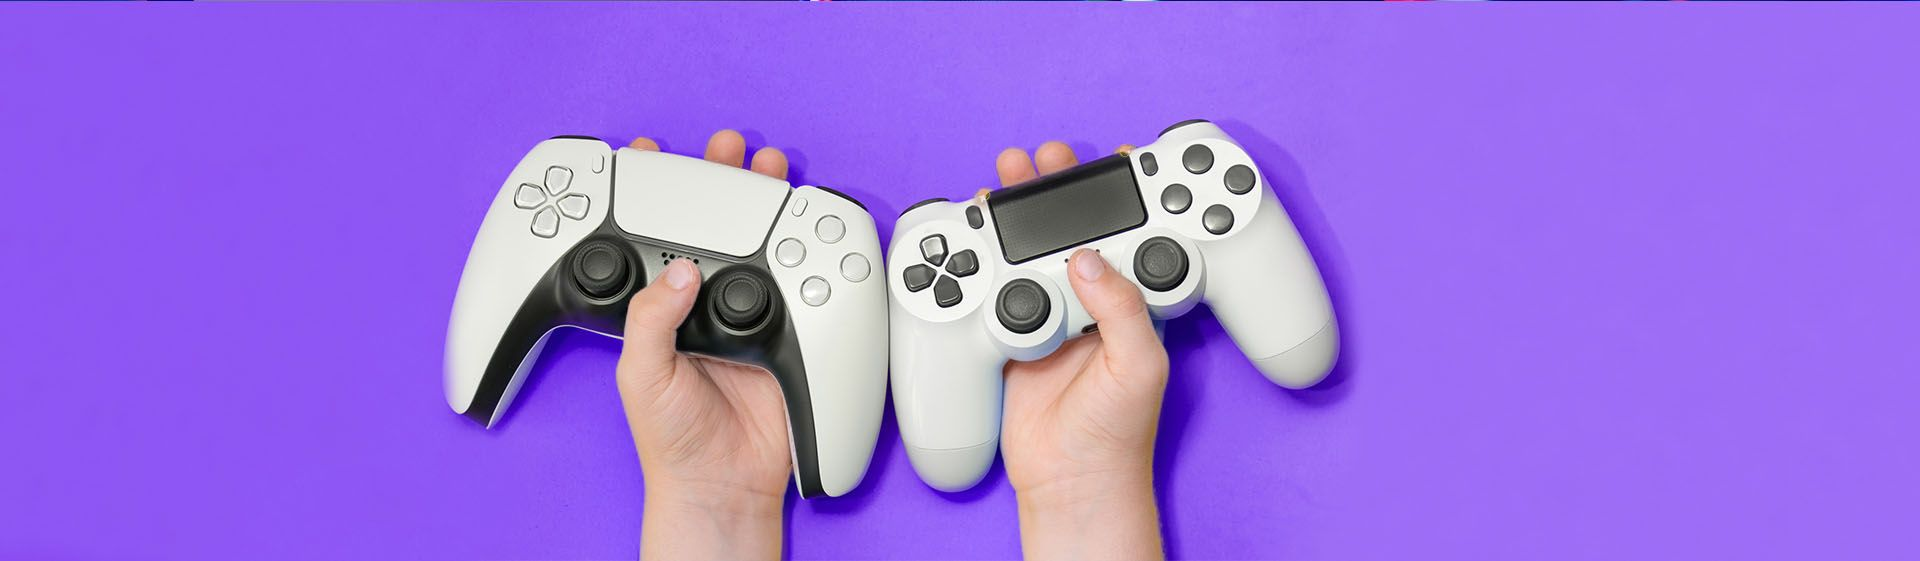 PS5 vs PS4 vs PS4 Pro: veja comparativo entre os consoles da Sony